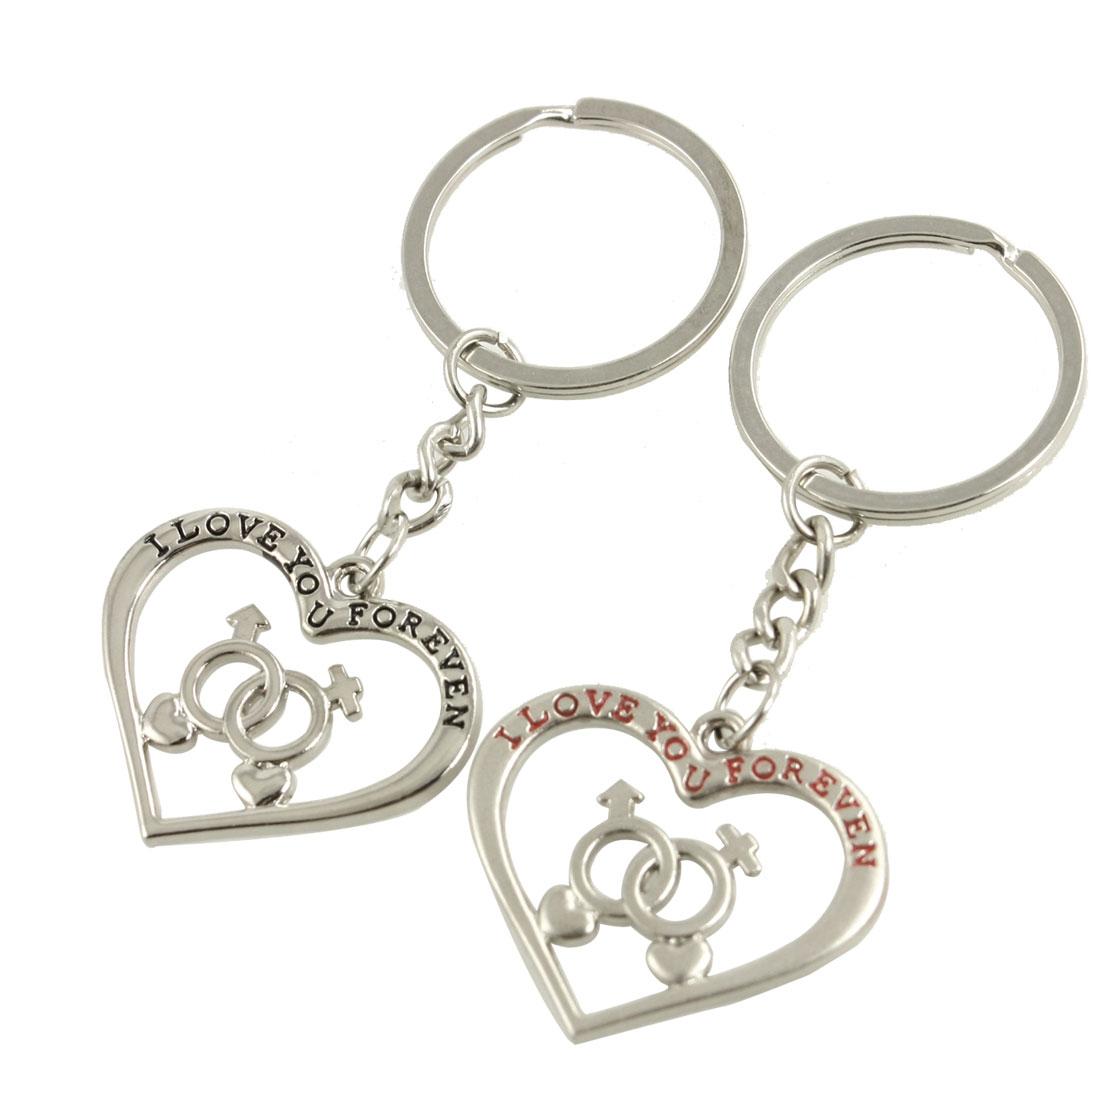 2 Pcs Metal Heart Pendant Keyring Keychains Silver Tone